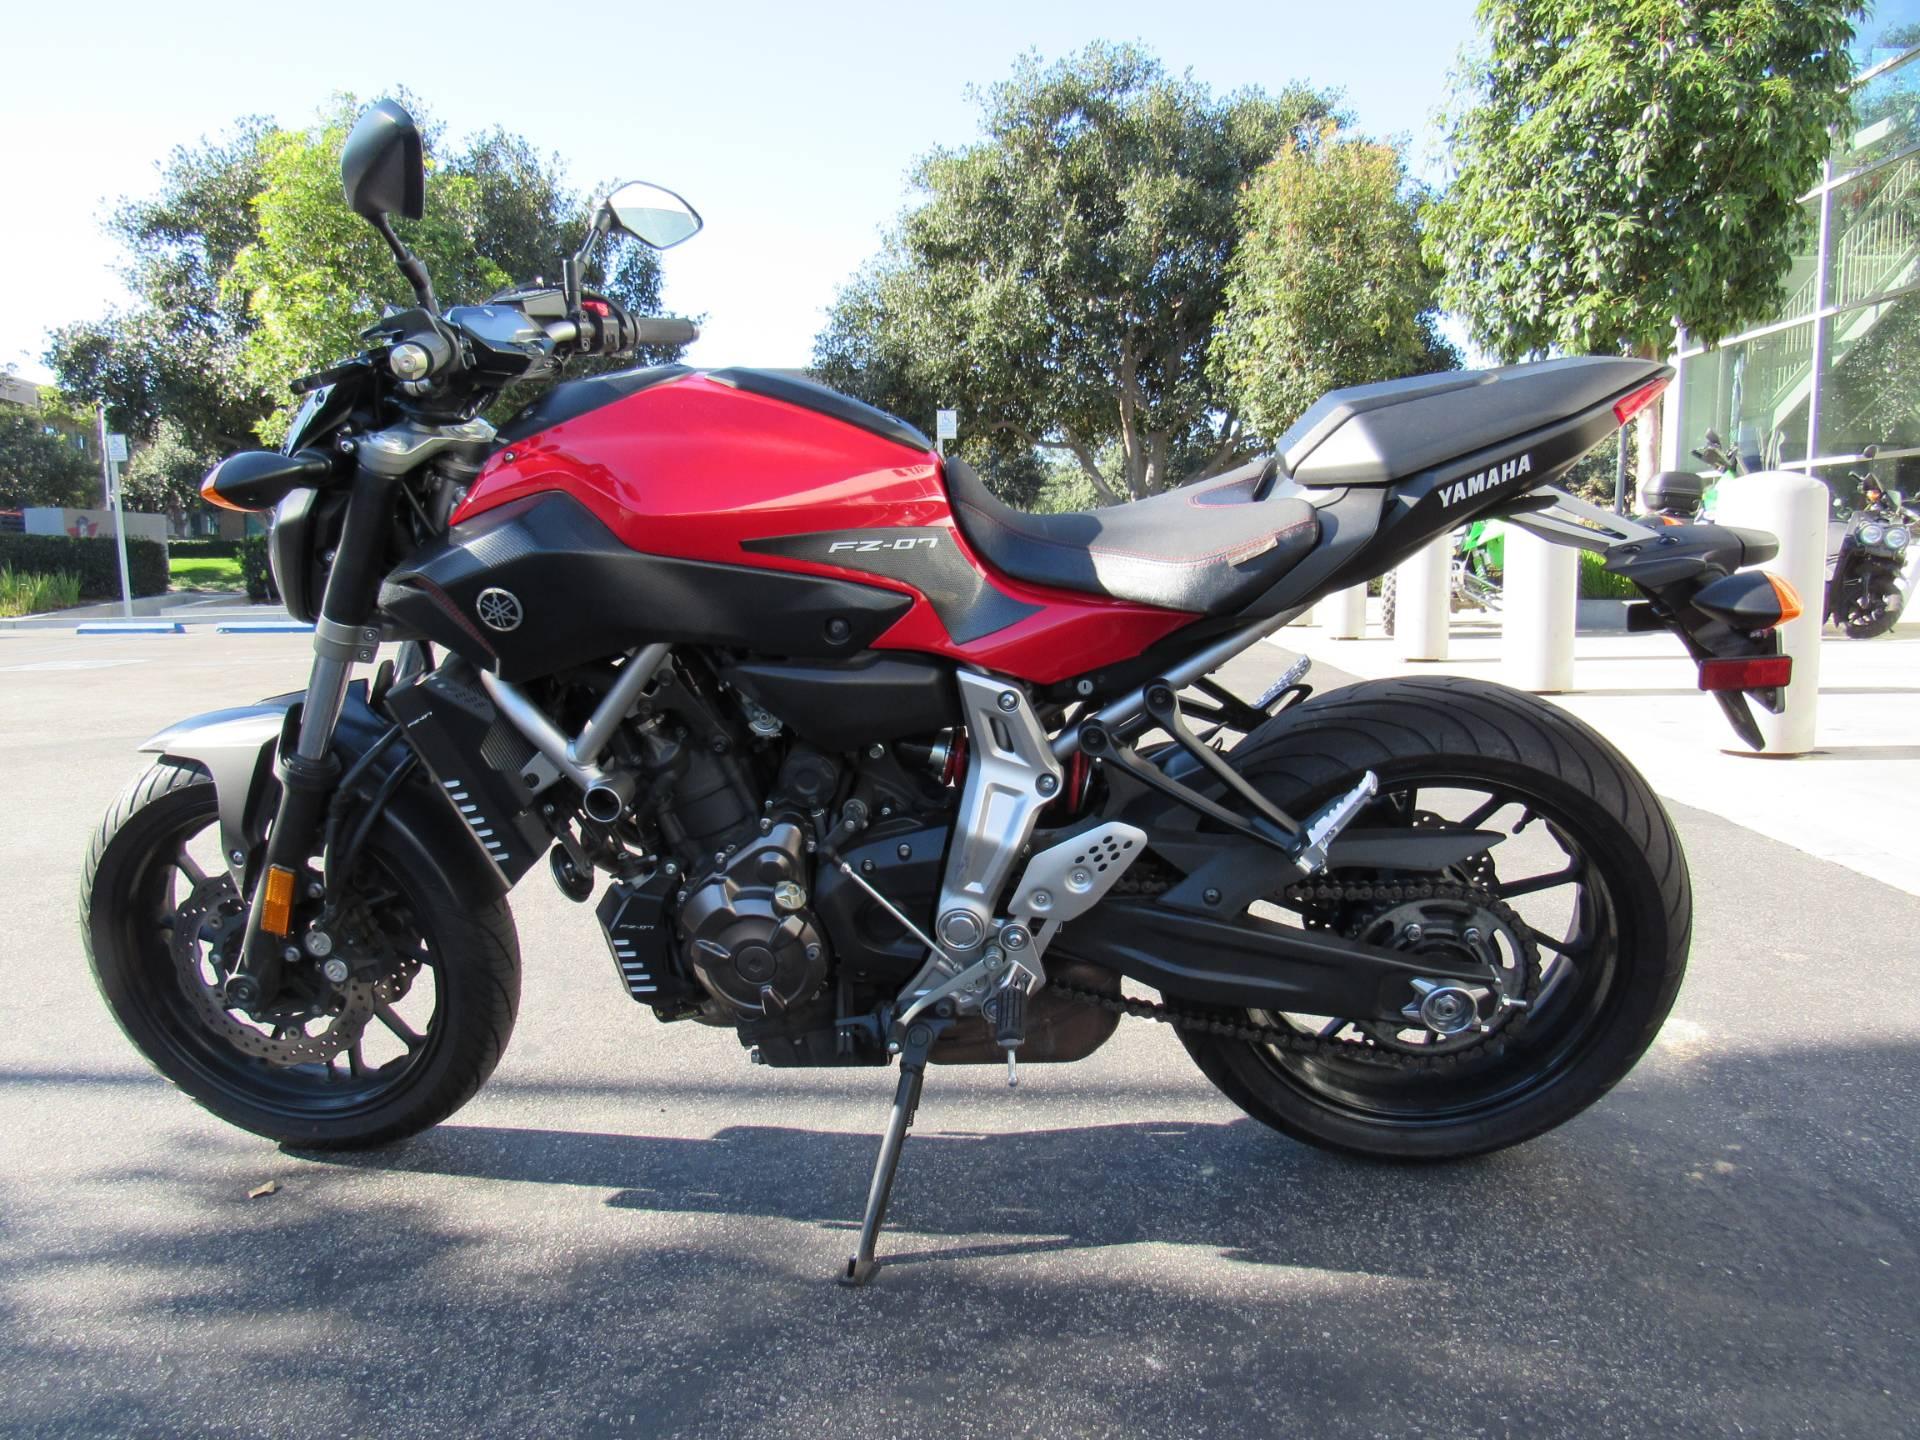 2015 Yamaha FZ-07 for sale 115497